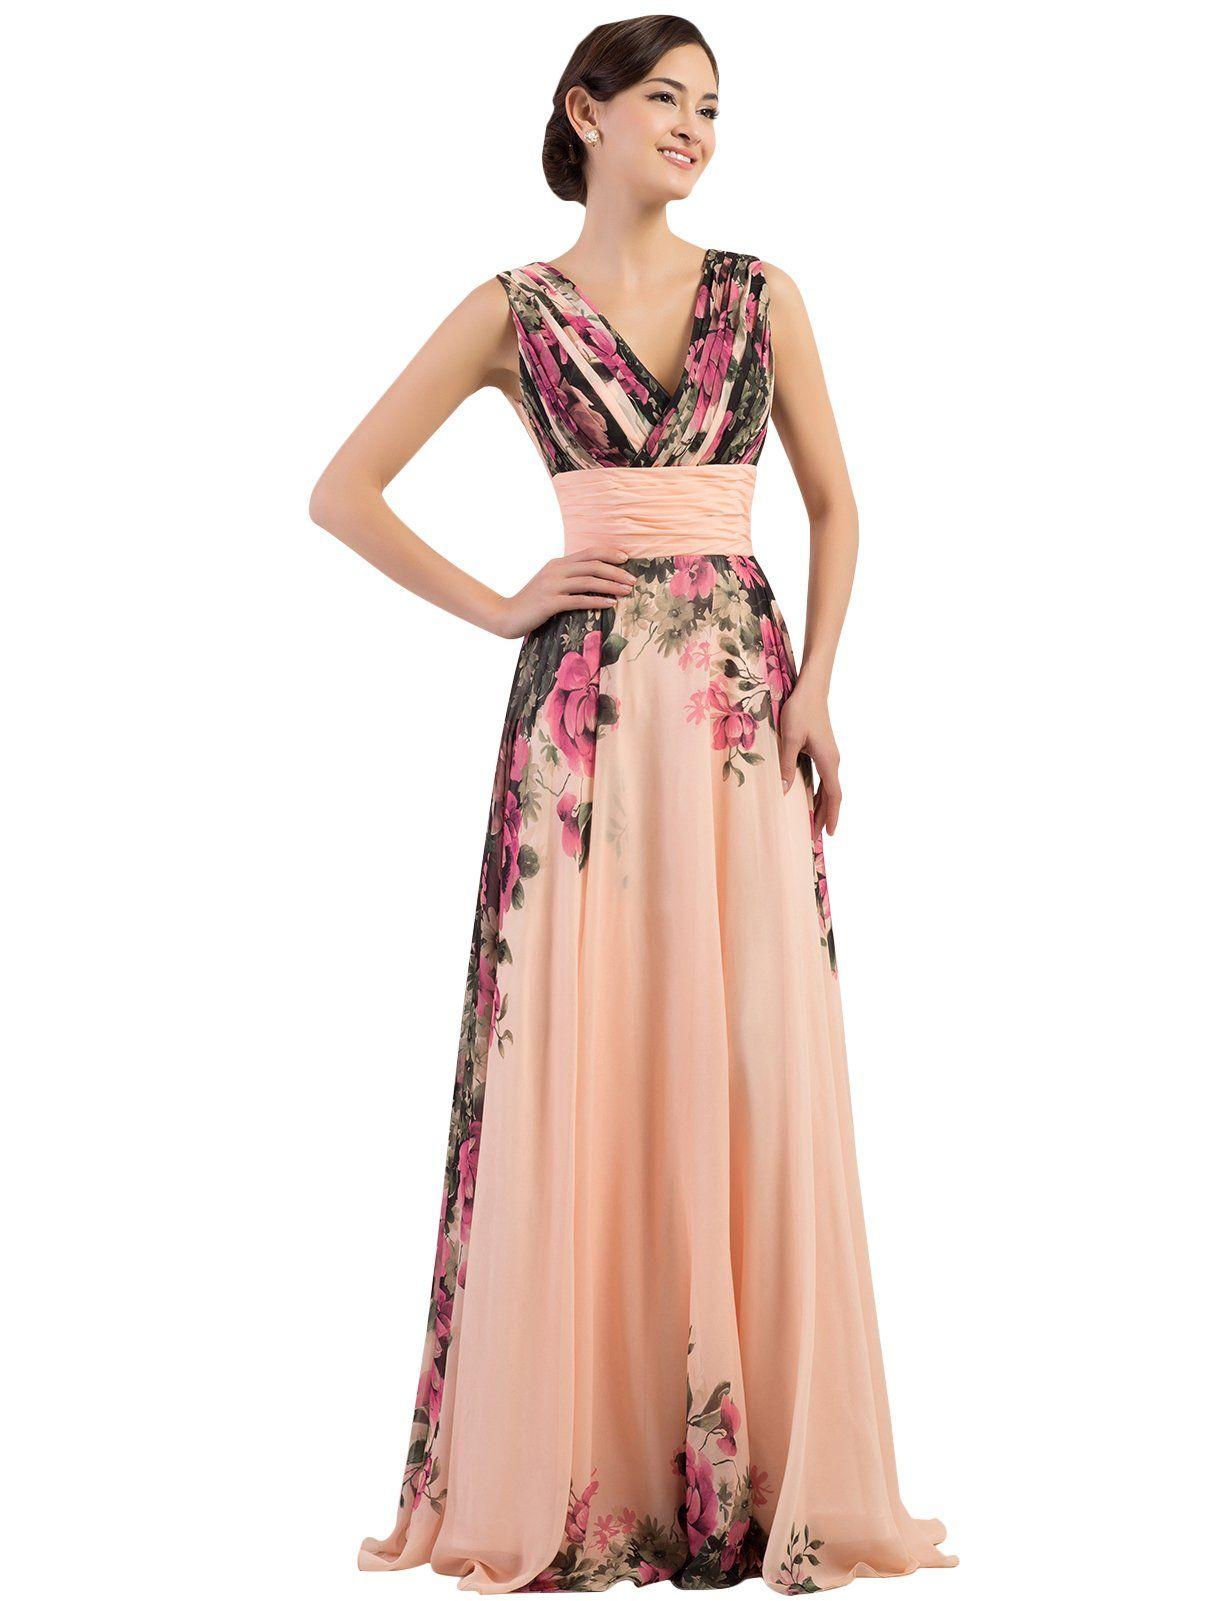 Graceful princess swing dress cocktail dresses size cl